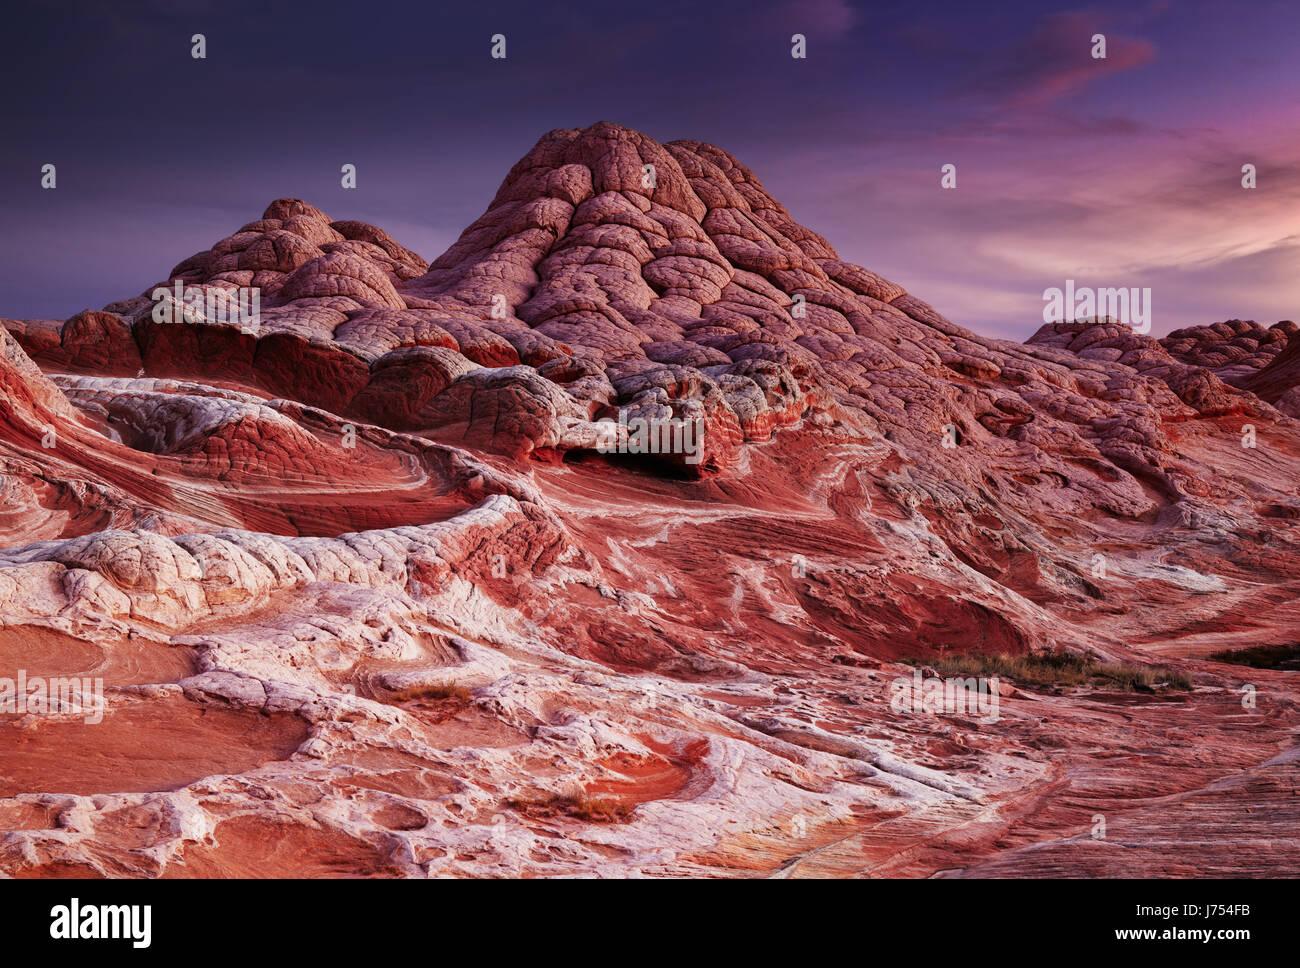 White Pocket rock formations, Vermilion Cliffs National Monument, Arizona, USA - Stock Image